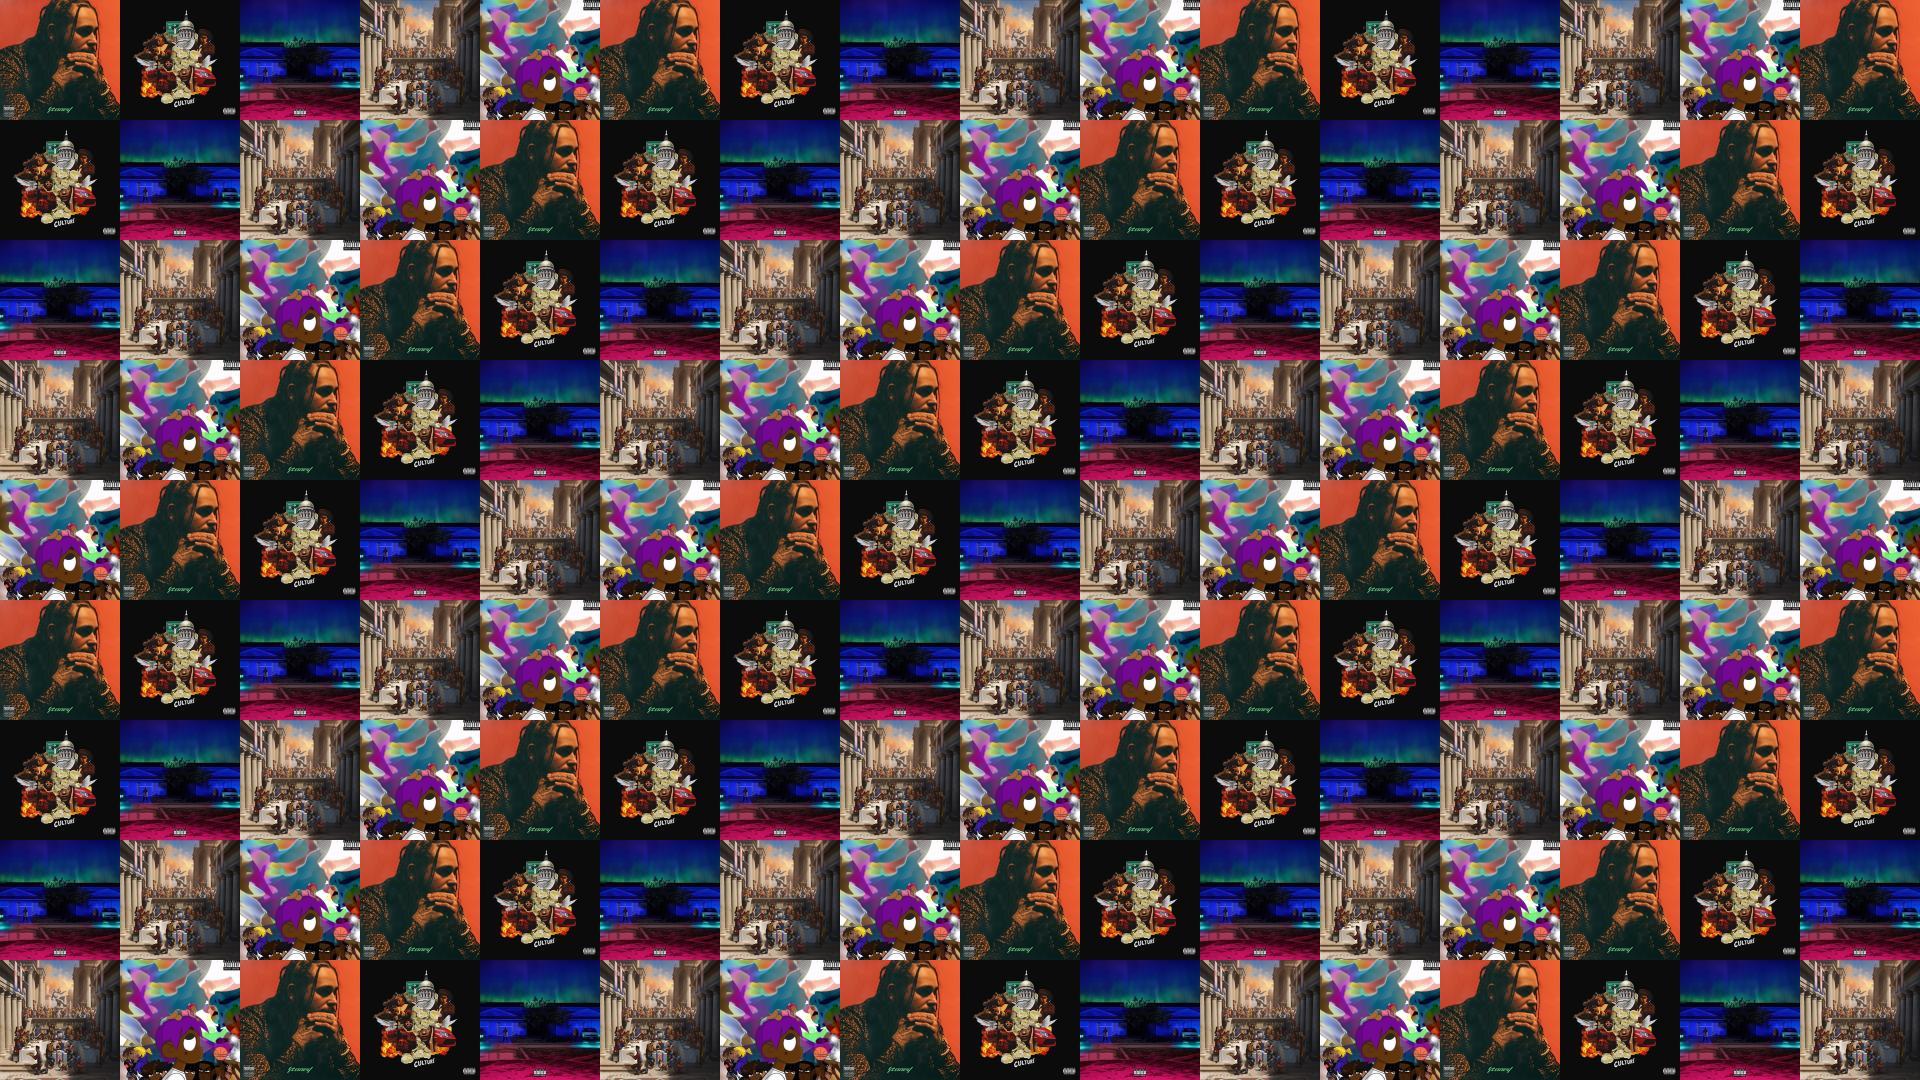 lil uzi vert vs the world full album download